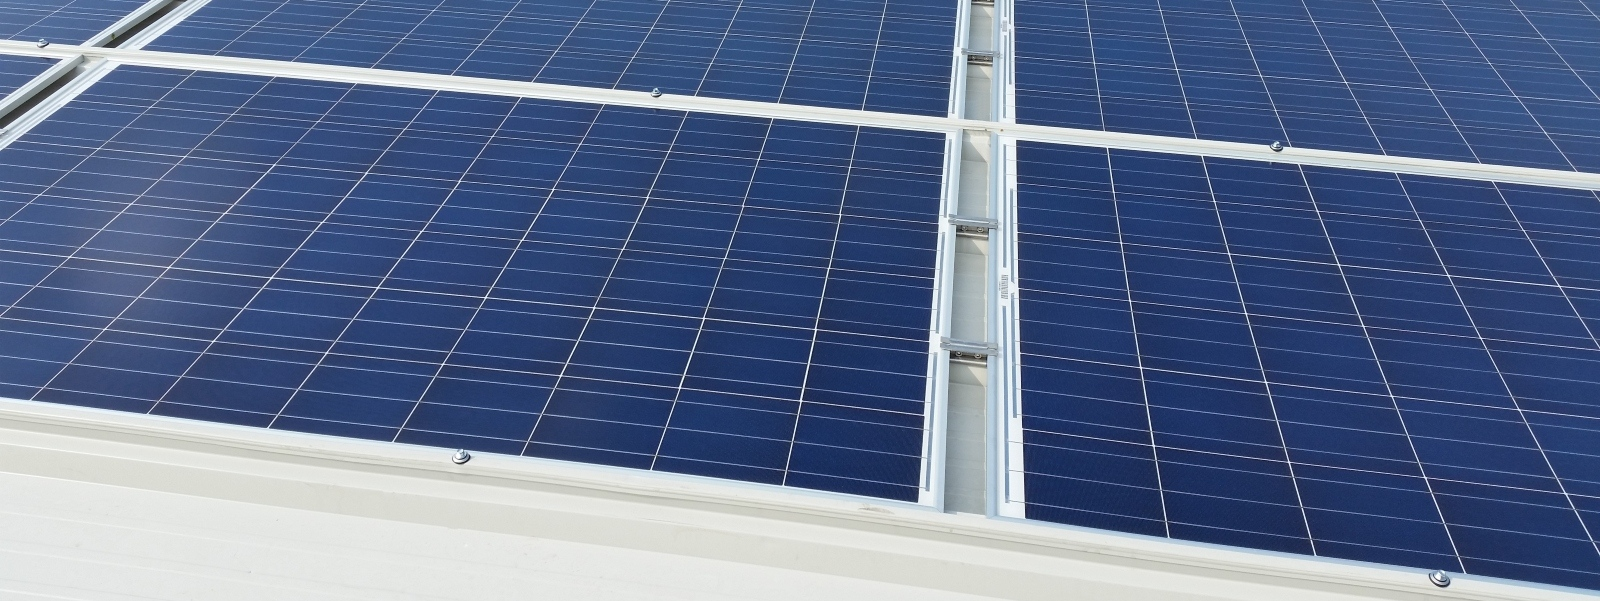 sistemi fotovoltaici integrati coibentati